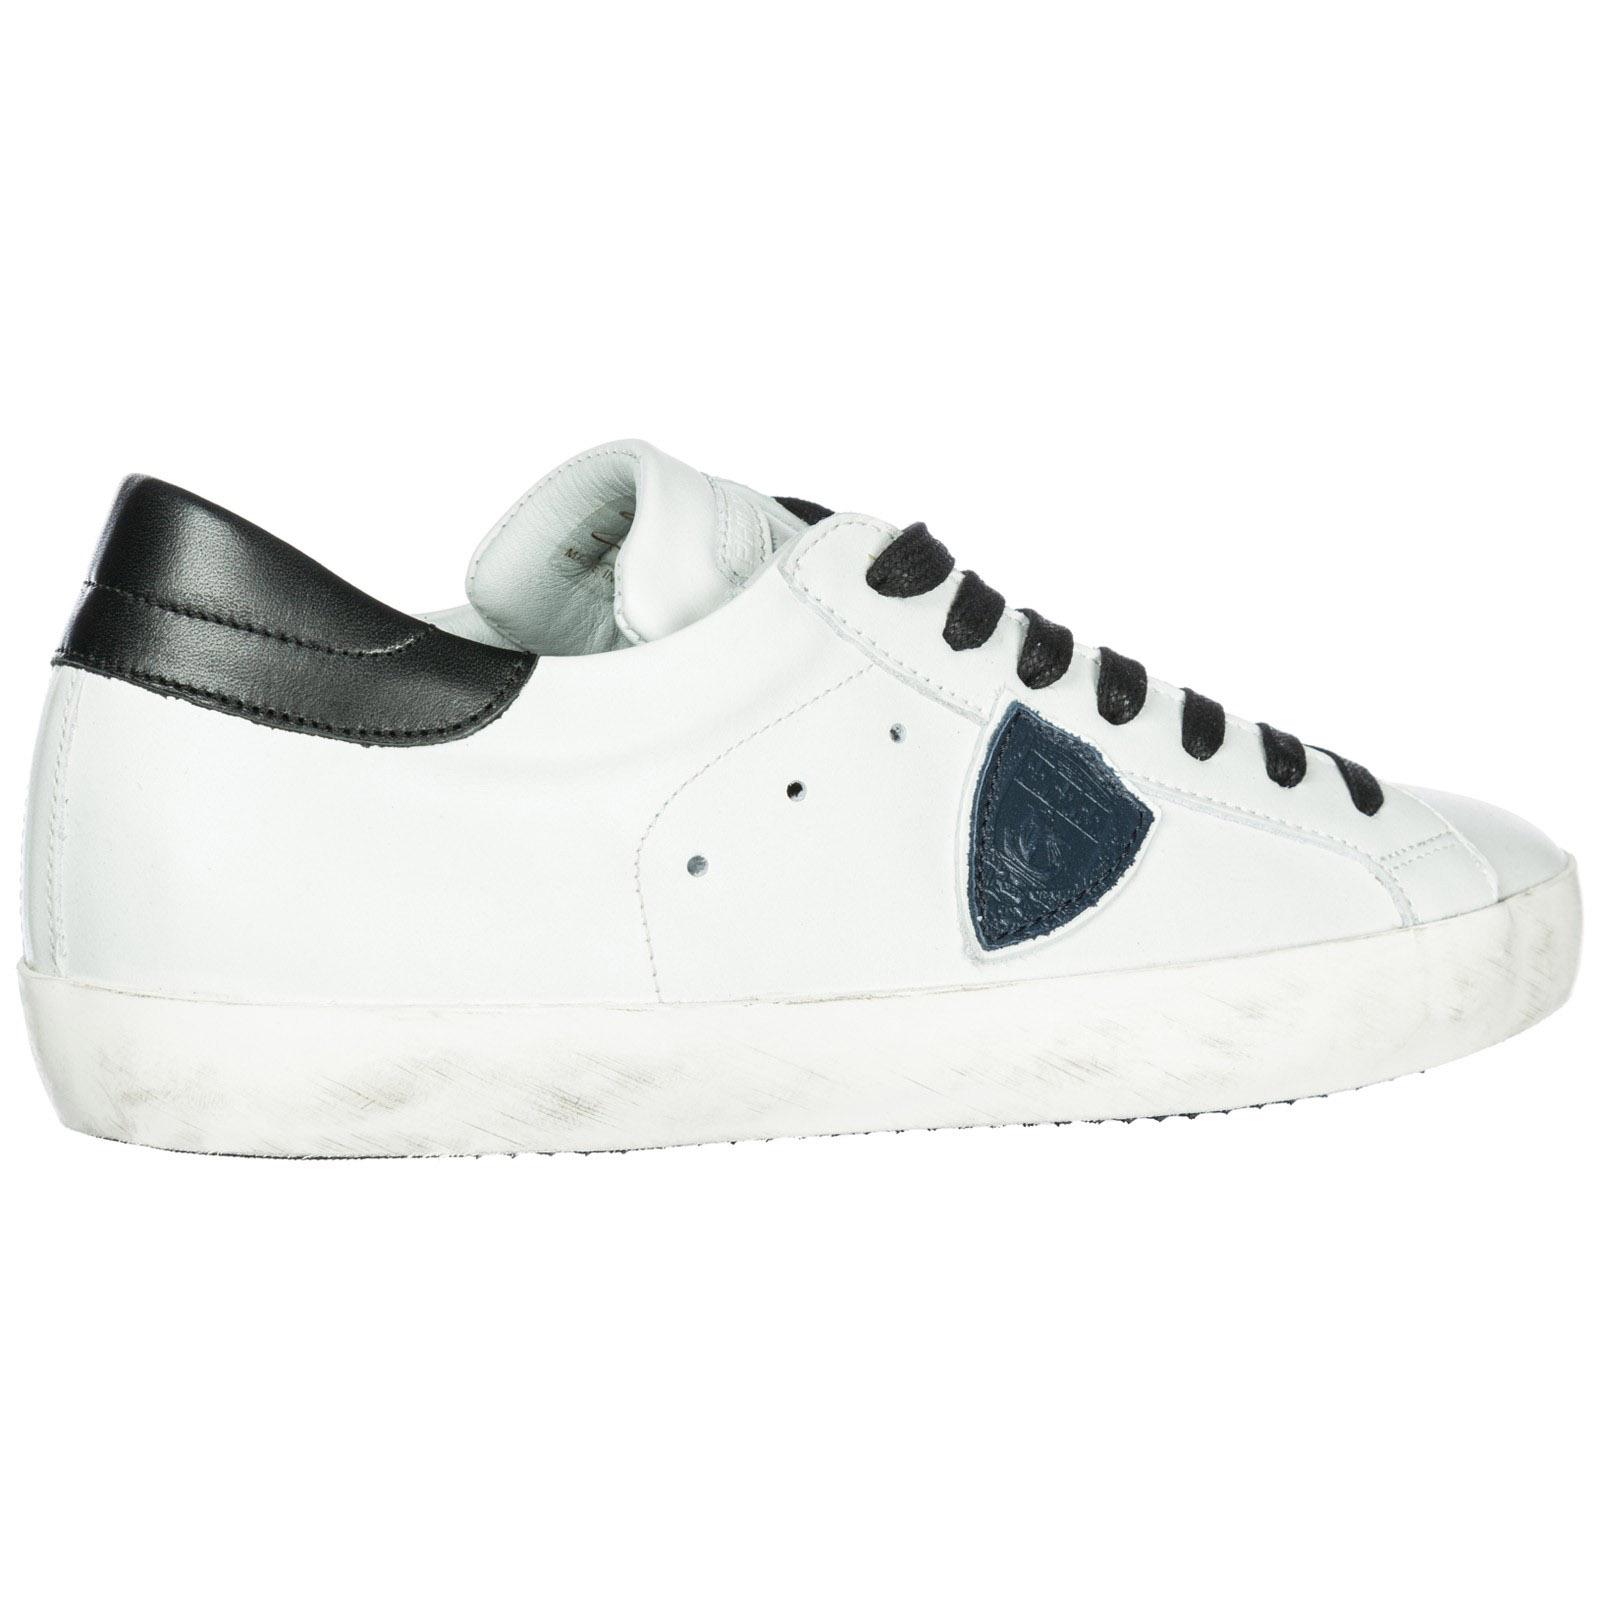 Sneakers Philippe Model A18ICLLUV058 blanc   bleu   noir  47f8c8e3626